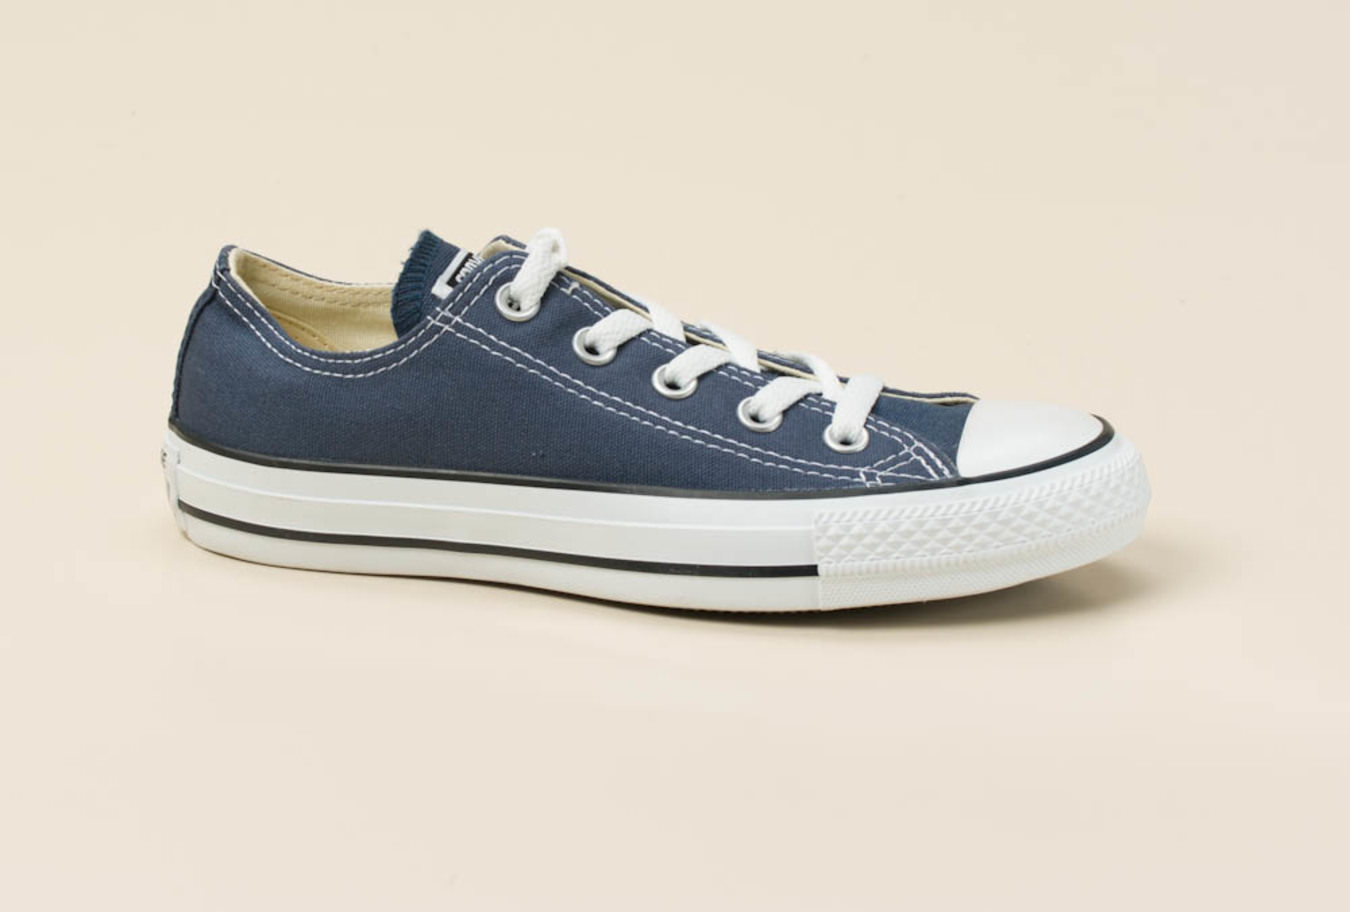 Converse Damen;Herren Sneaker in dunkelblau kaufen | Zumnorde Online Shop